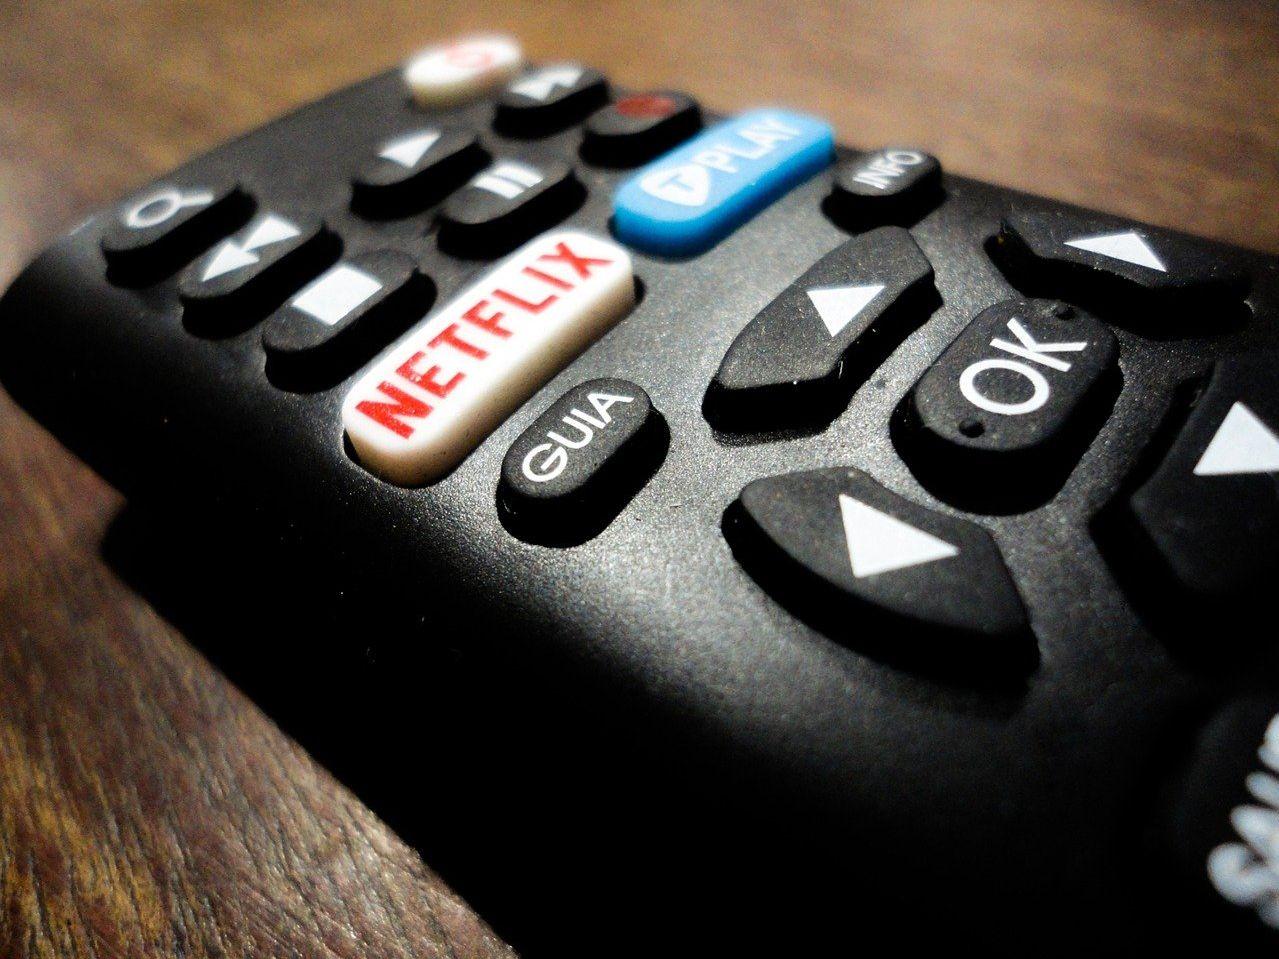 Un control remoto con botón de Netflix